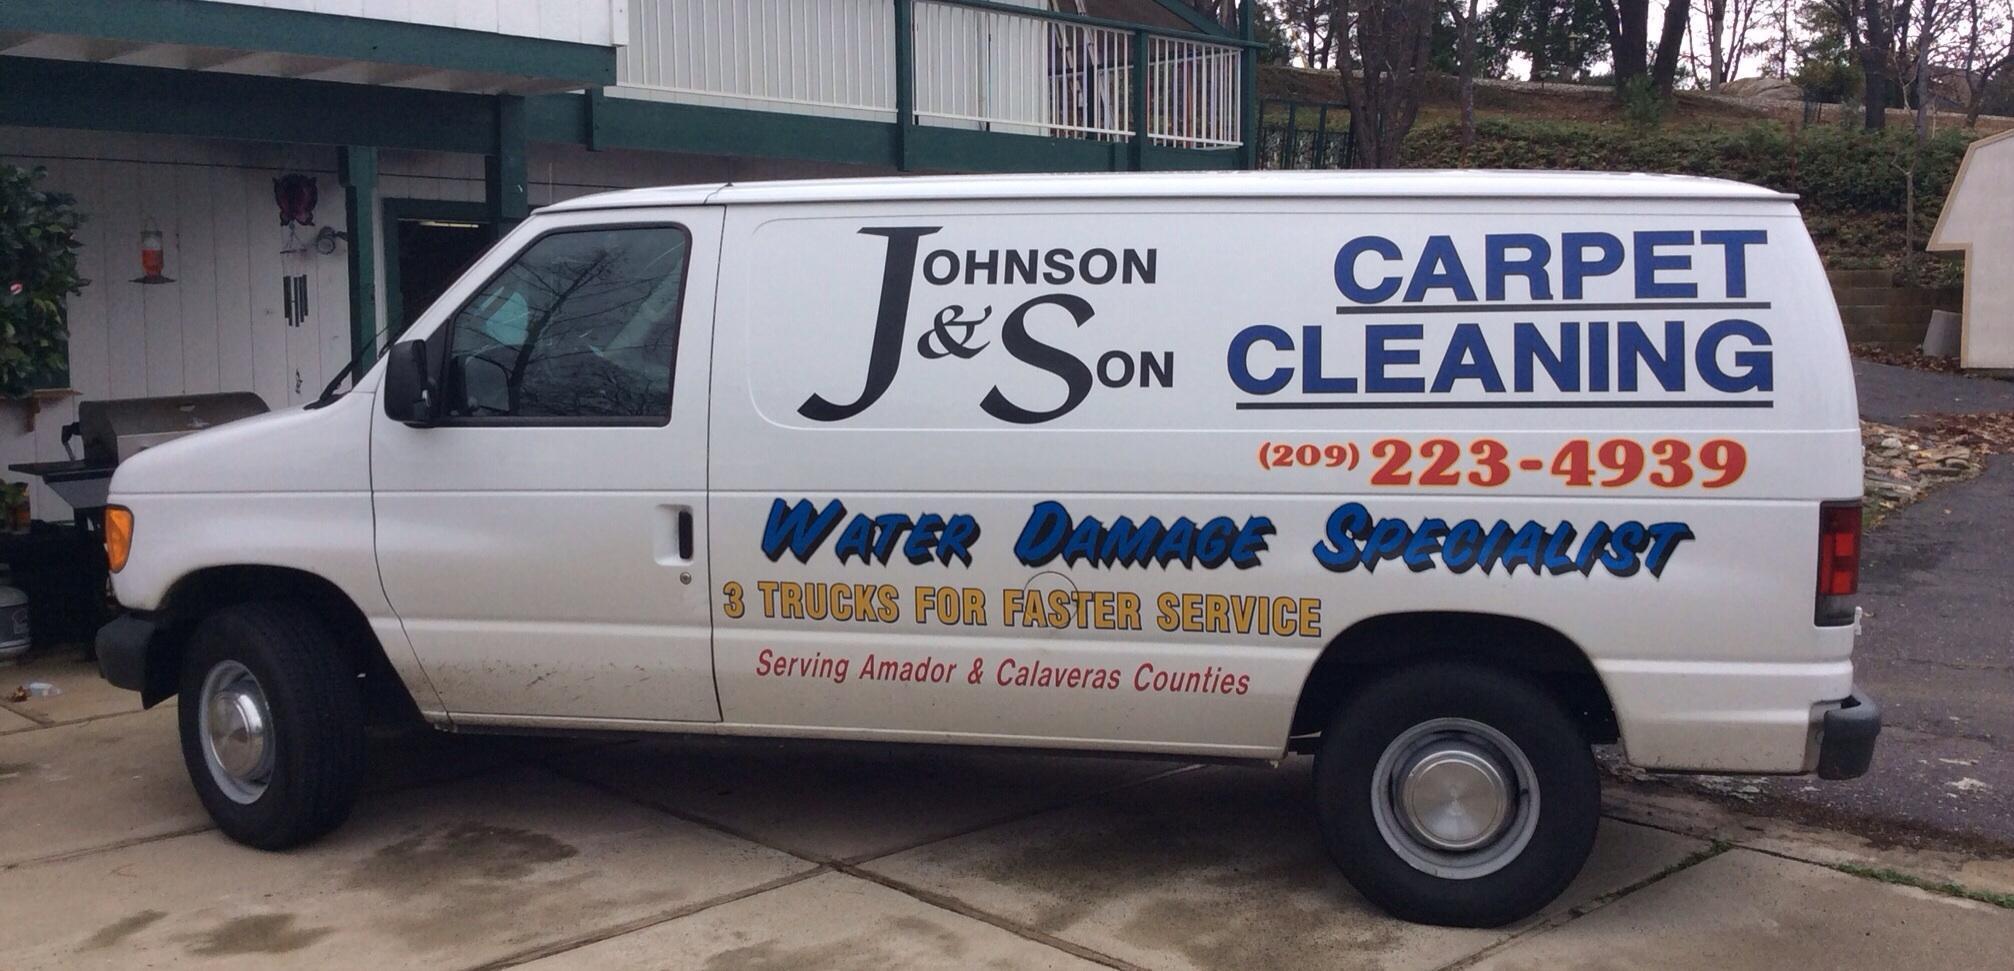 Johnson & Son Carpet Cleaning